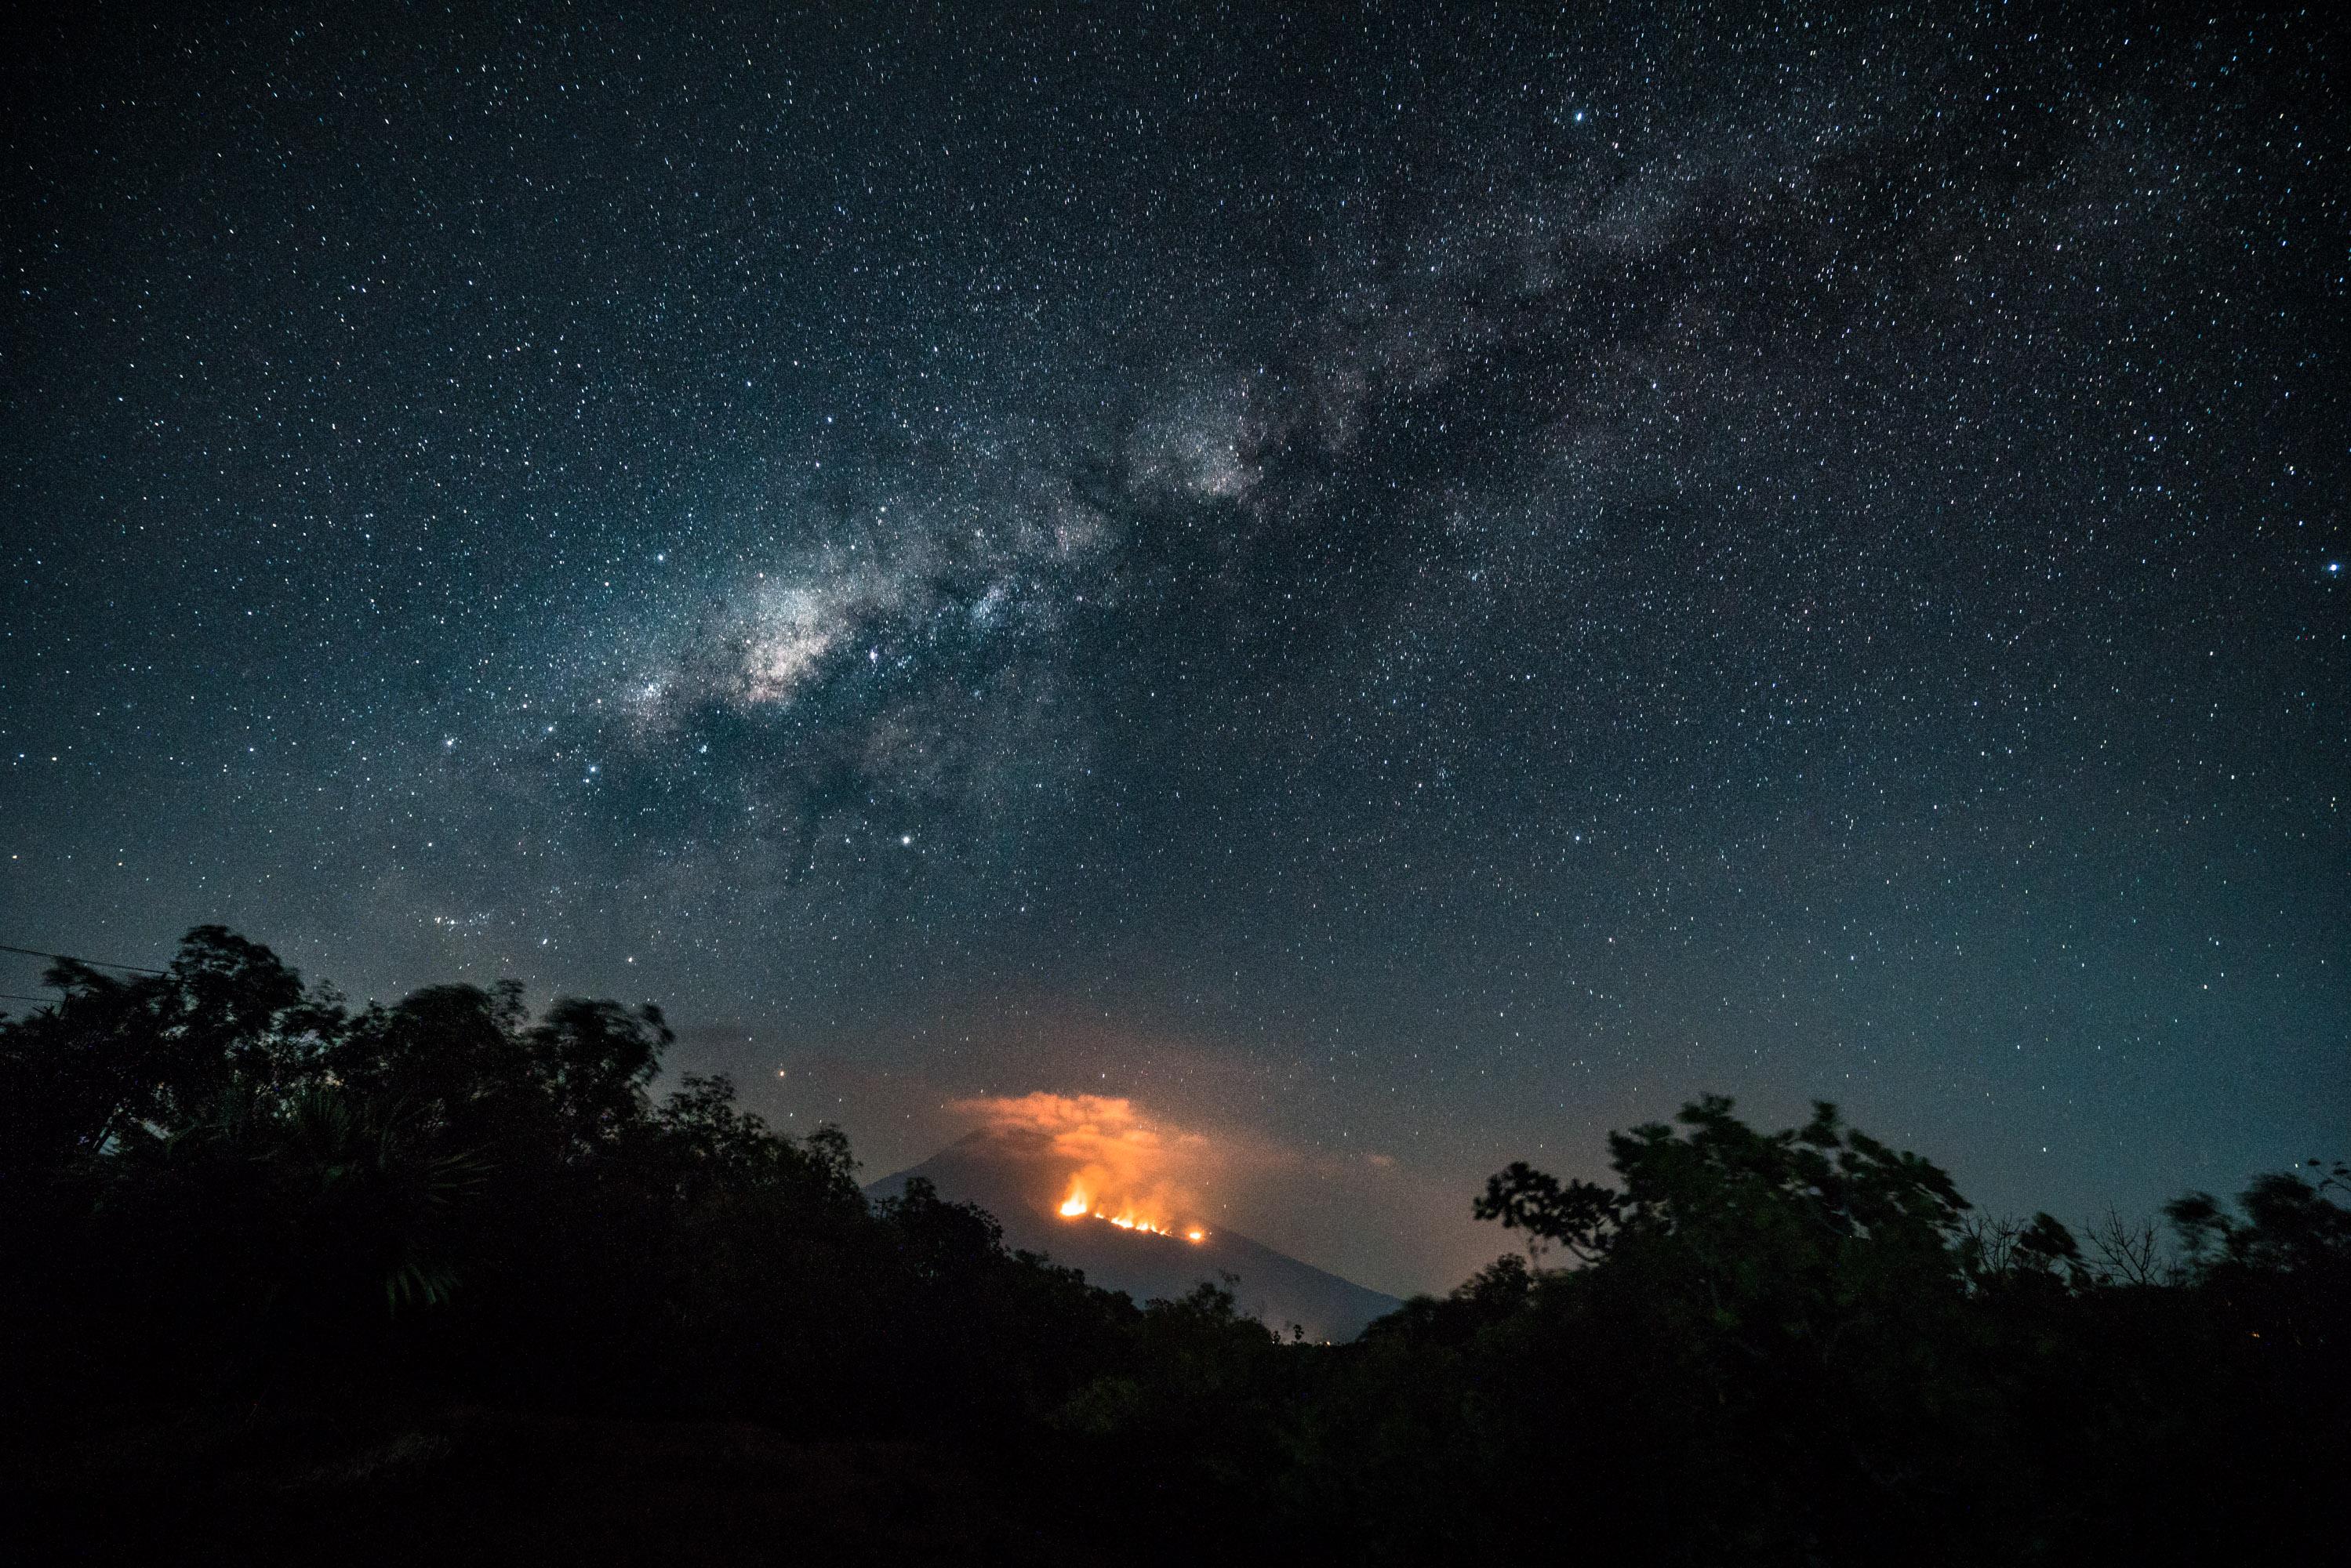 Mount Agung, Bali. An Eruption Looms.